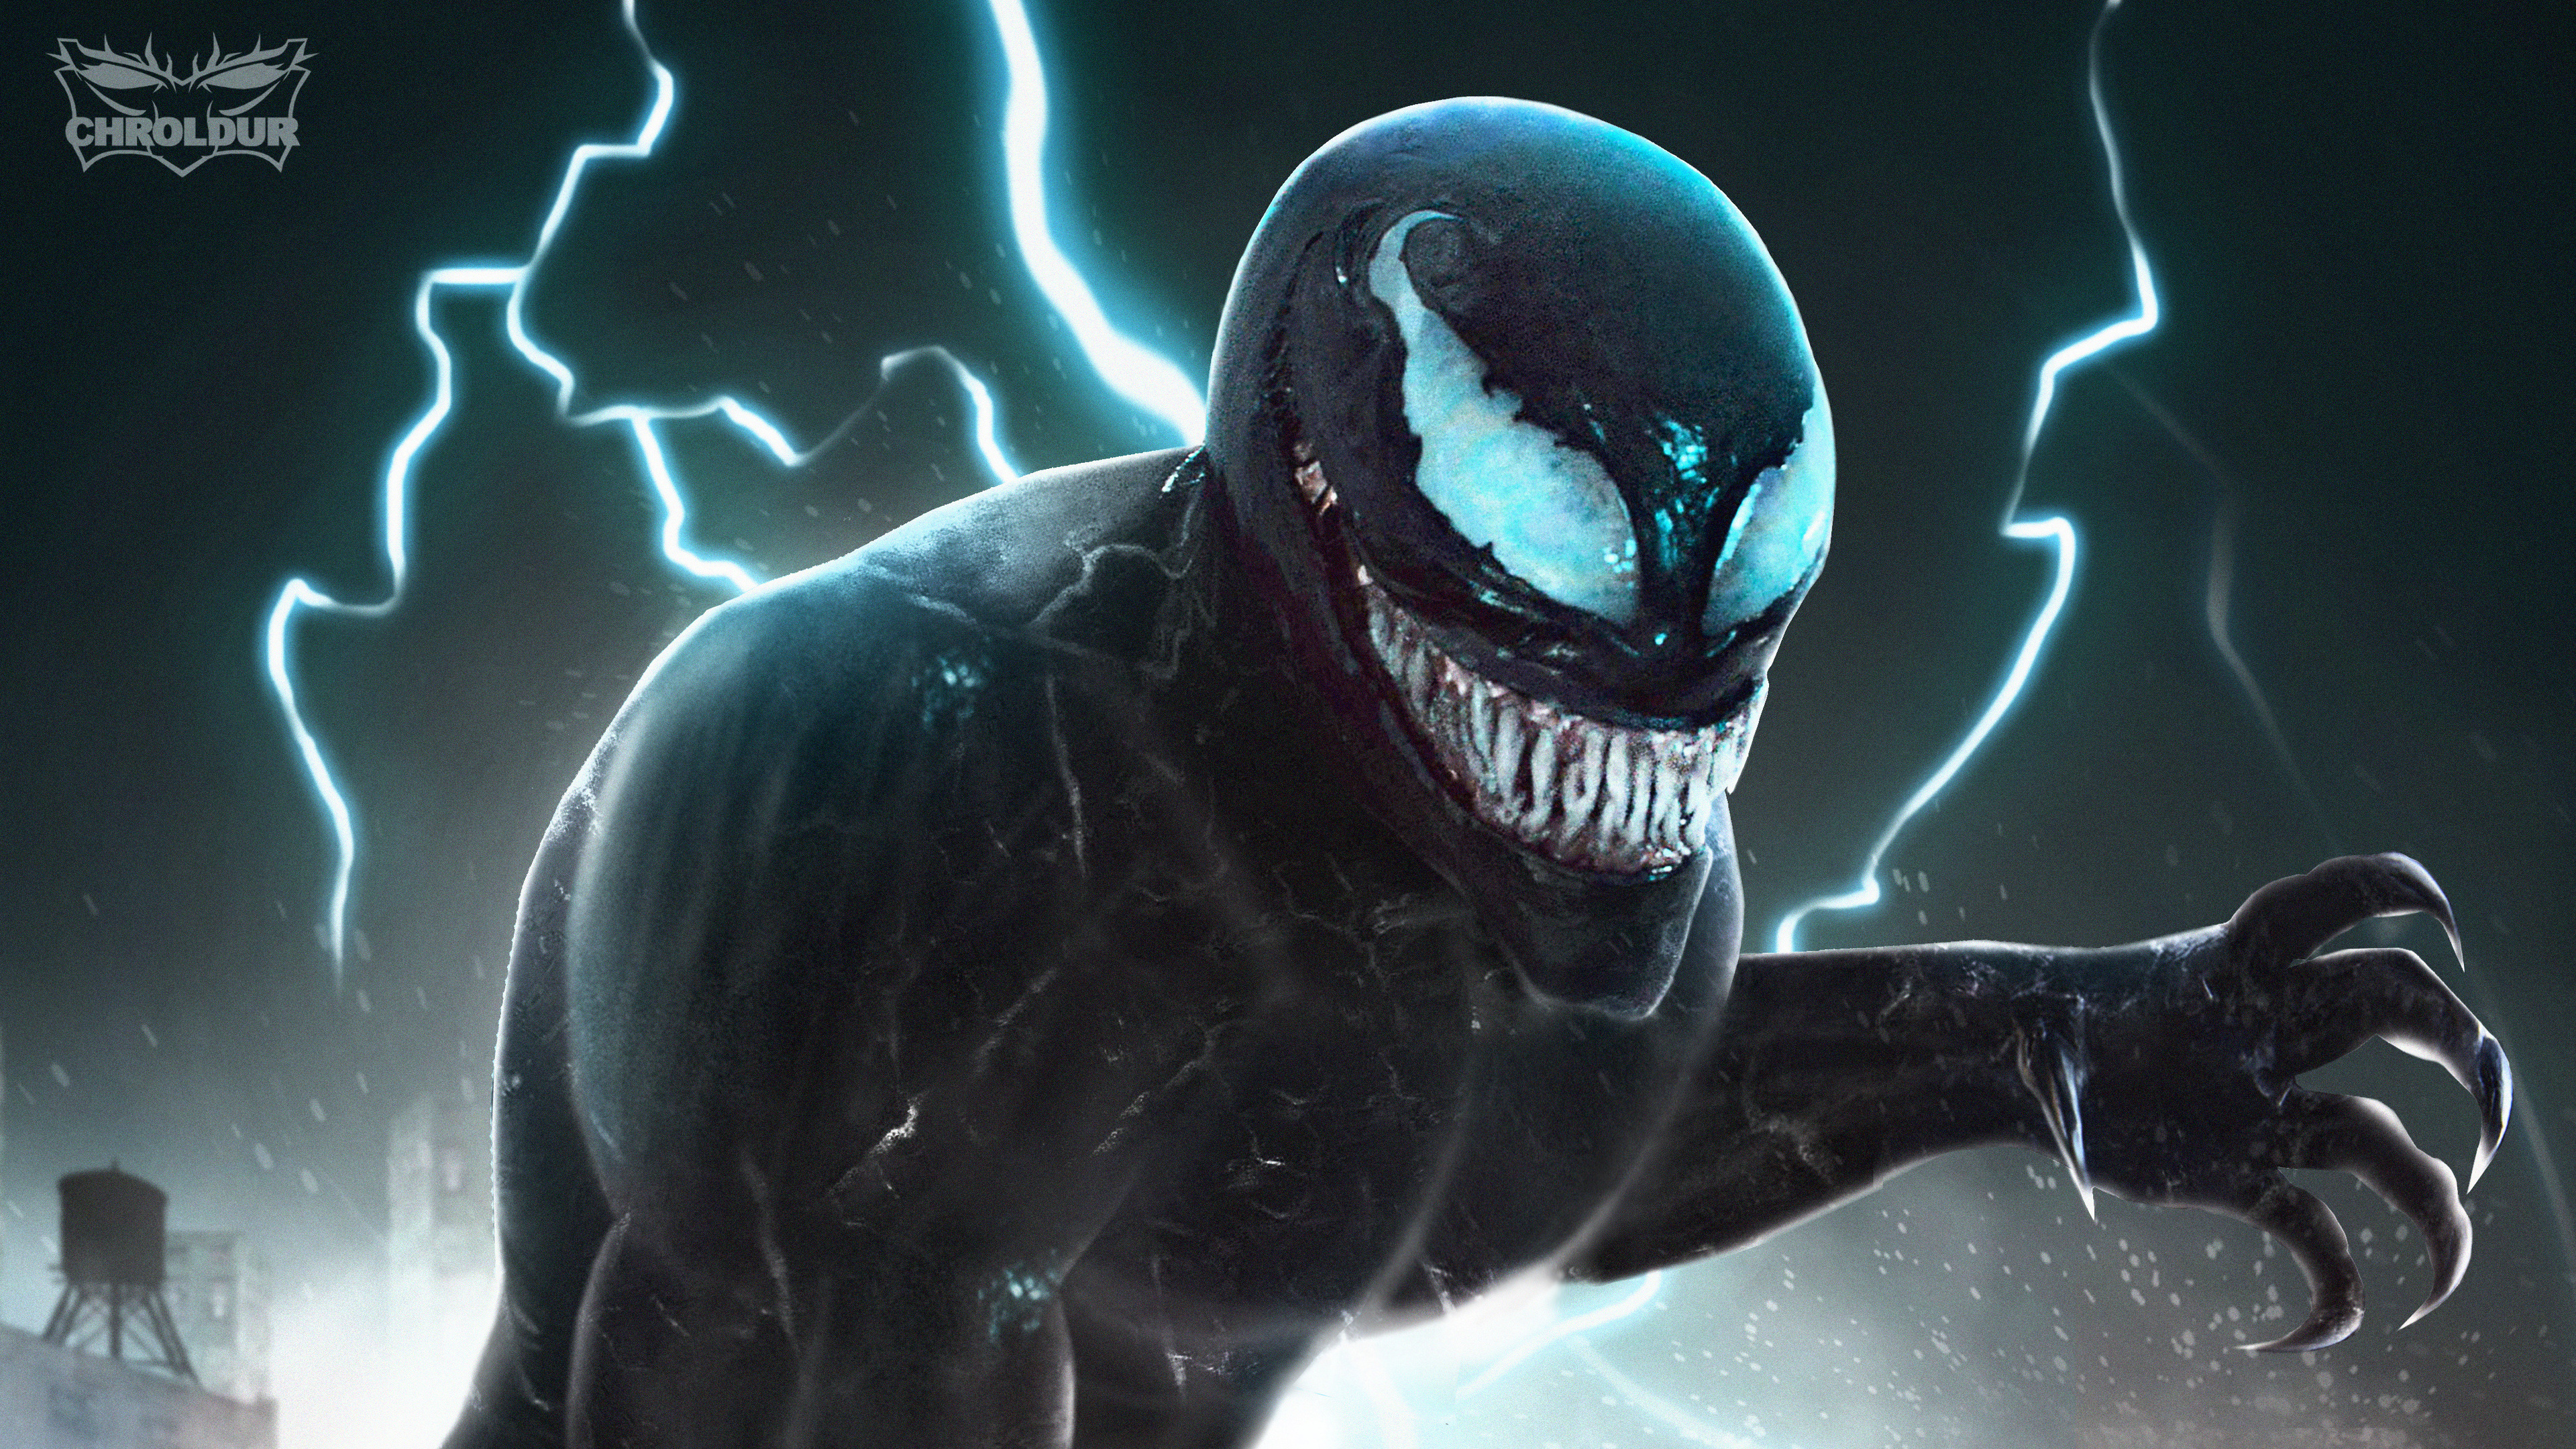 3840x2160 Venom Movie Artwork 4k 4k HD 4k Wallpapers ...